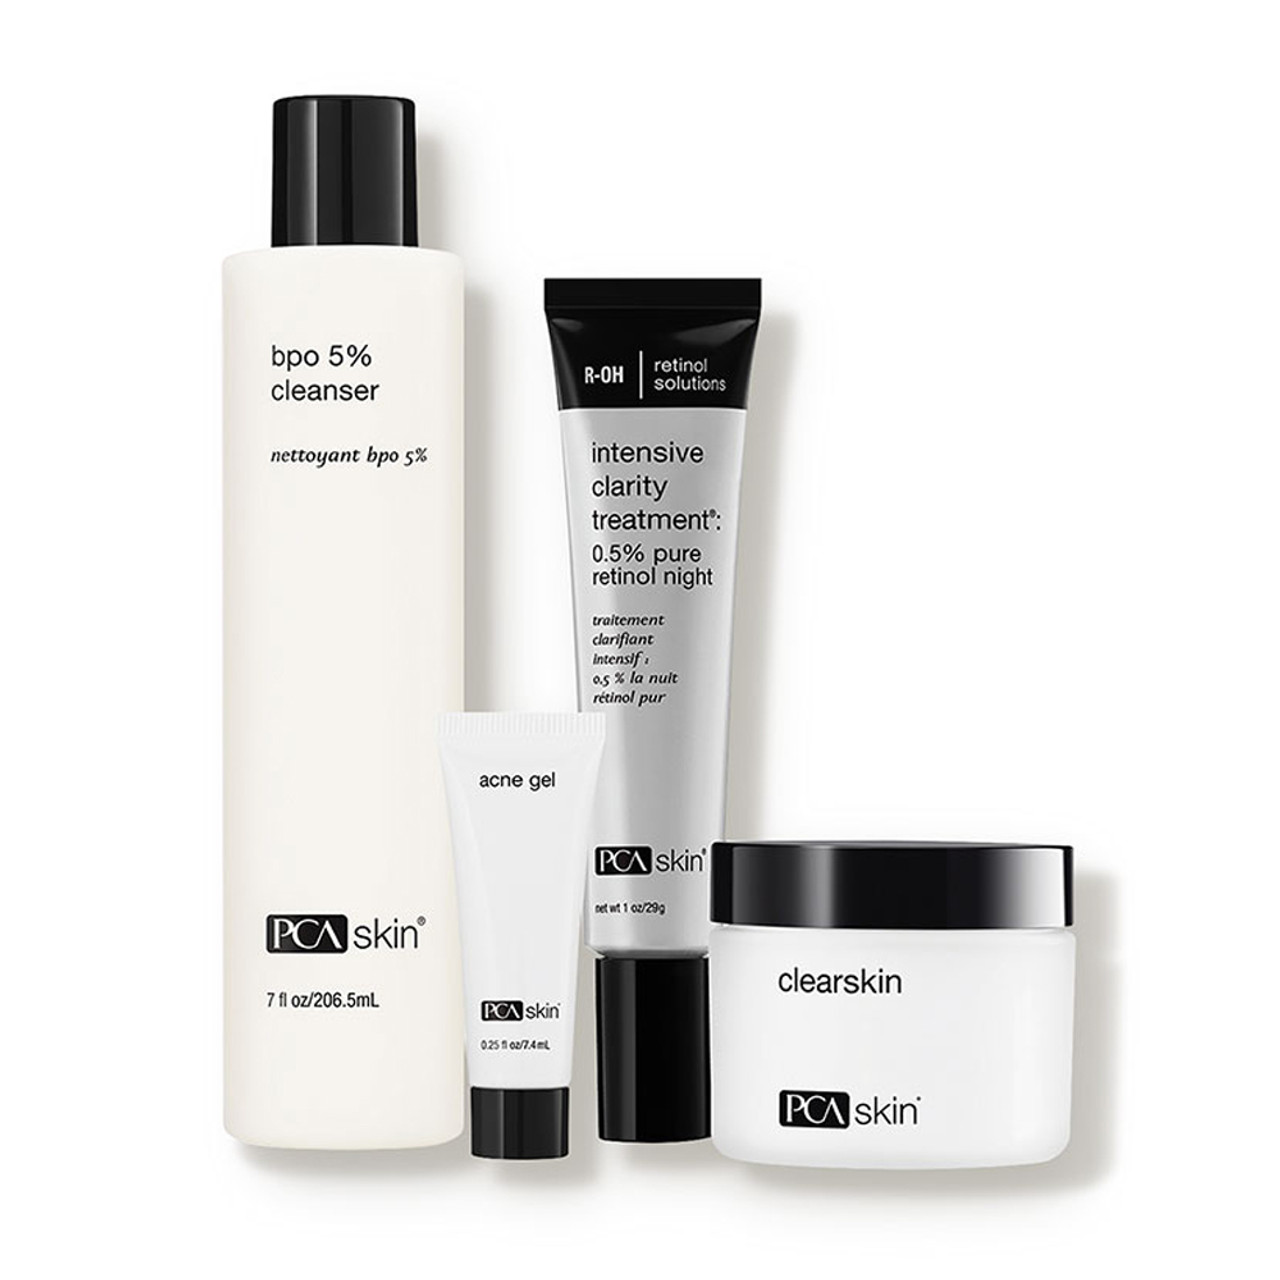 PCA Skin Acne Control Regimen